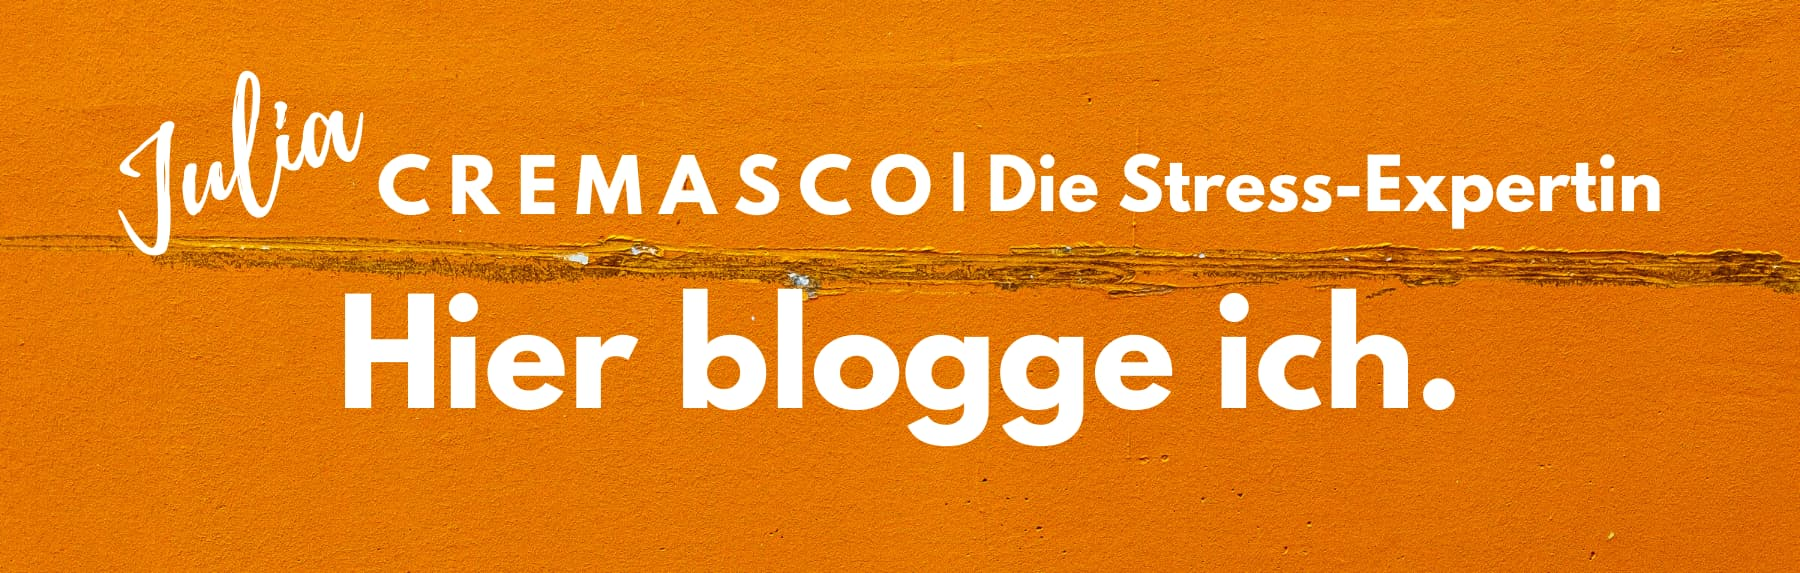 Blog - Die Stress Expertin